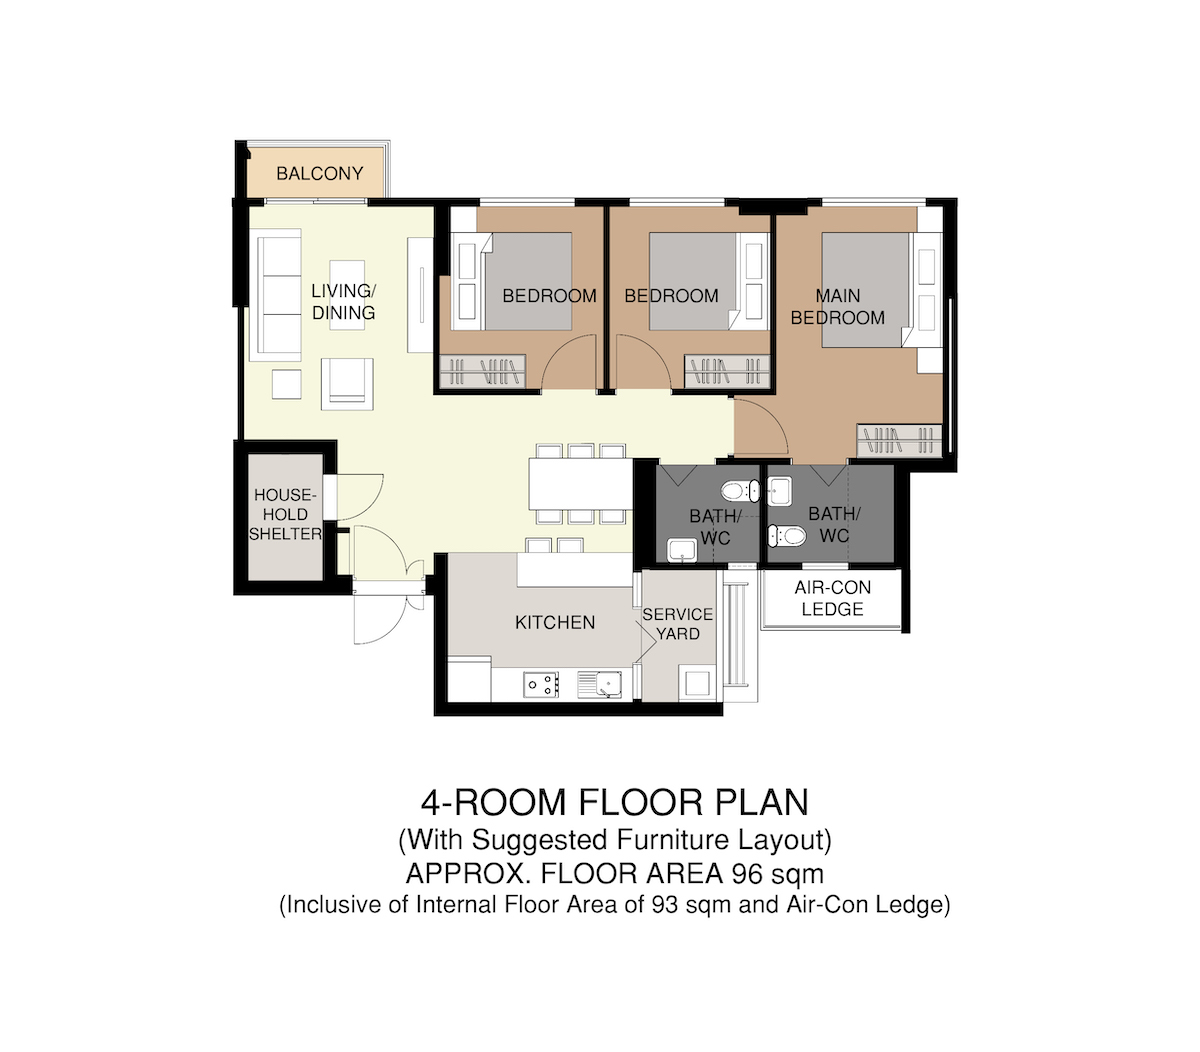 Punggol Point Crown Floor Plan 4-Room 96sqm